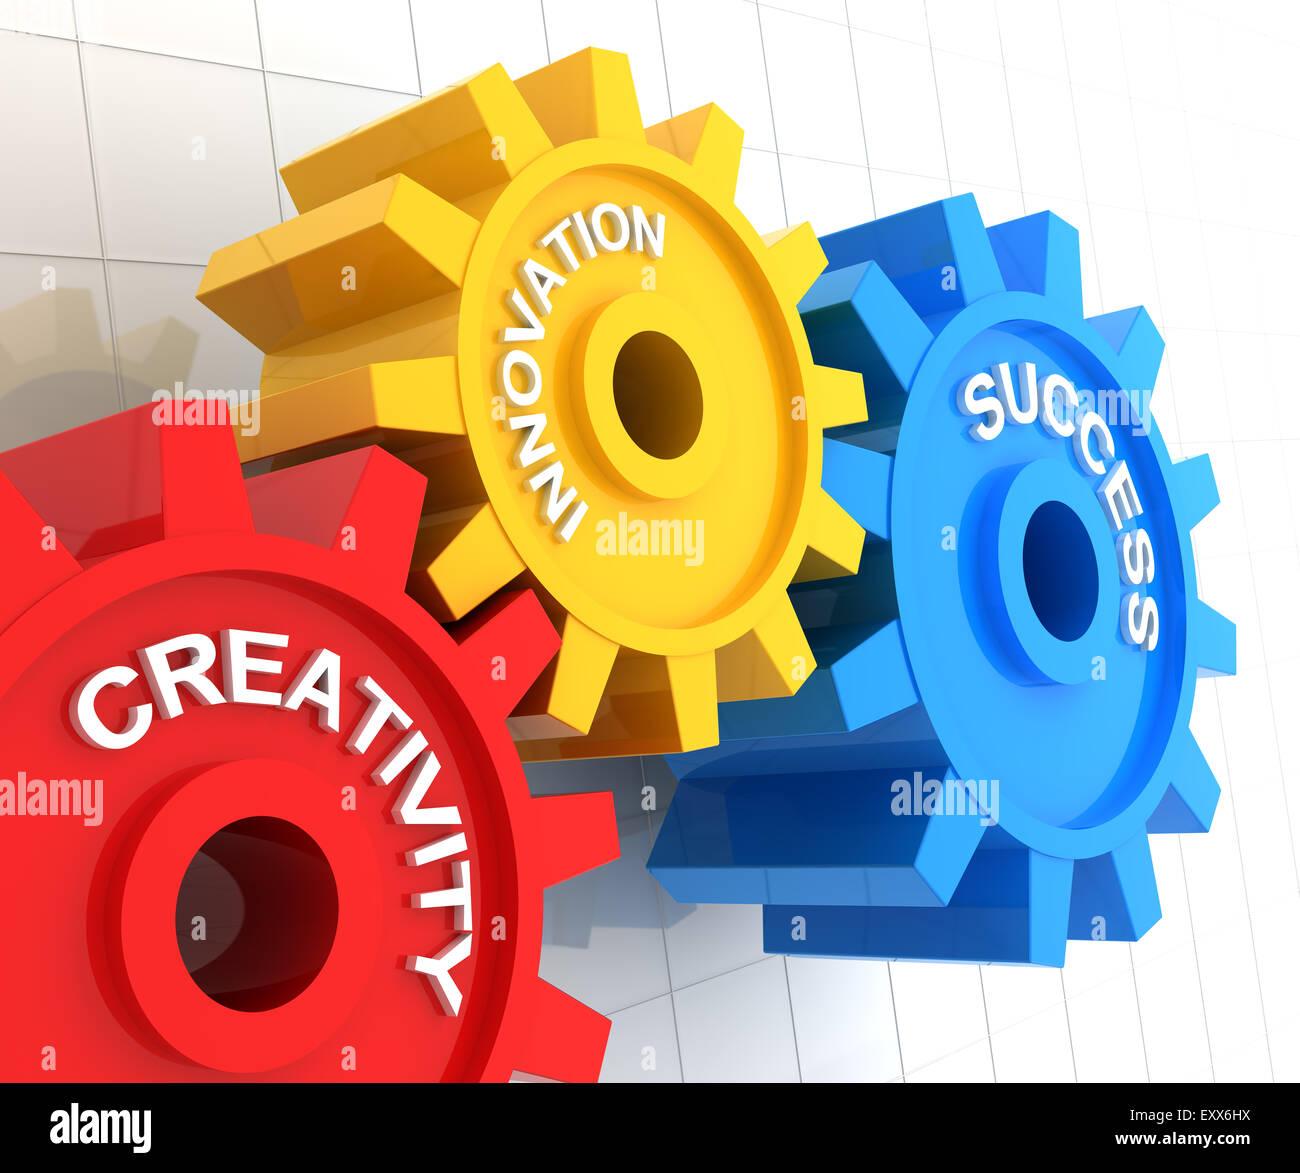 Creativity, innovation and success - Stock Image